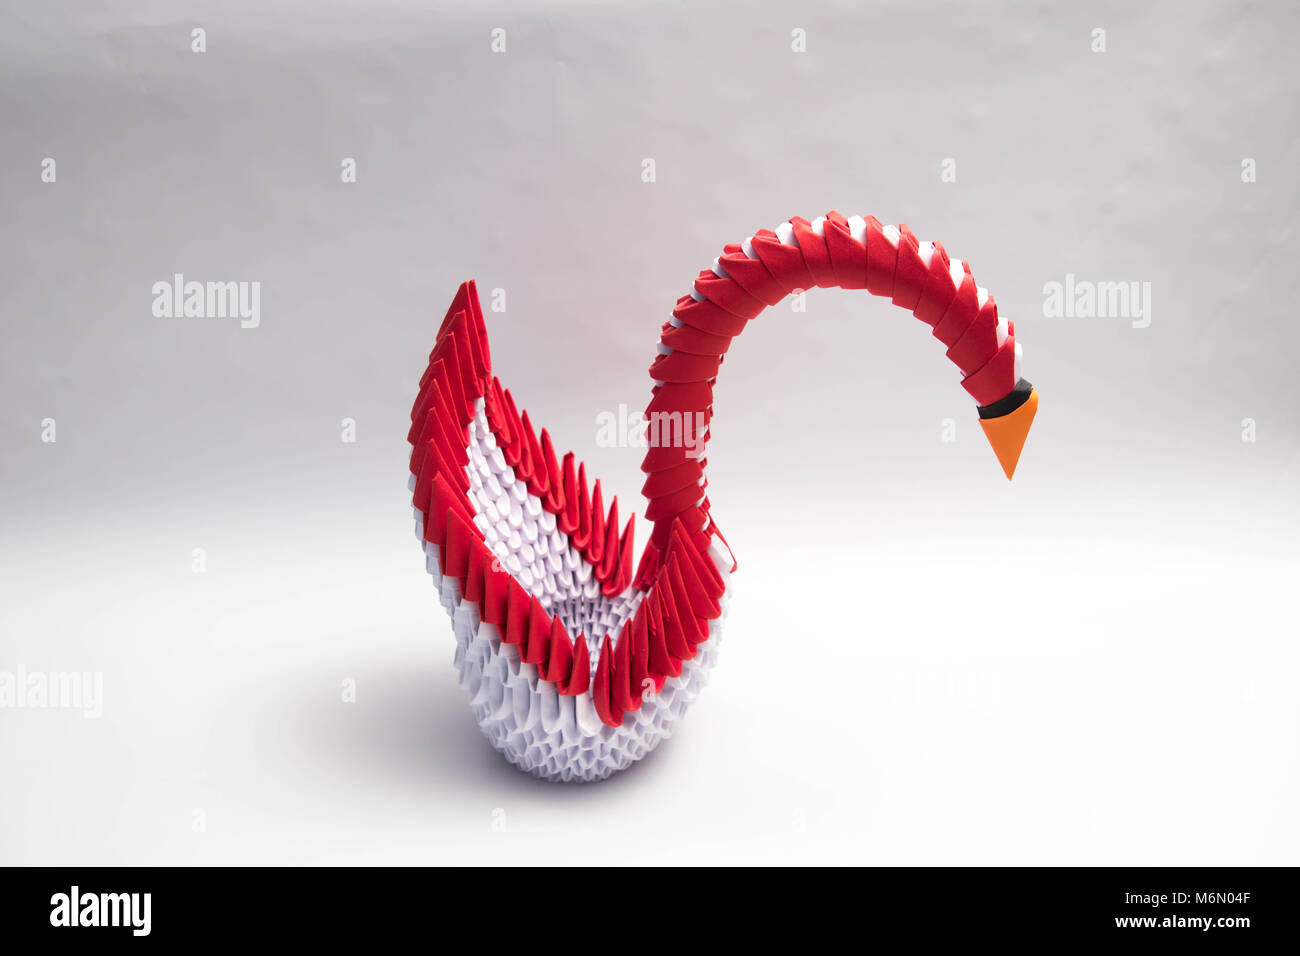 2 3d origami swans   Samsung digimax 360   Jewellia   Flickr   956x1300